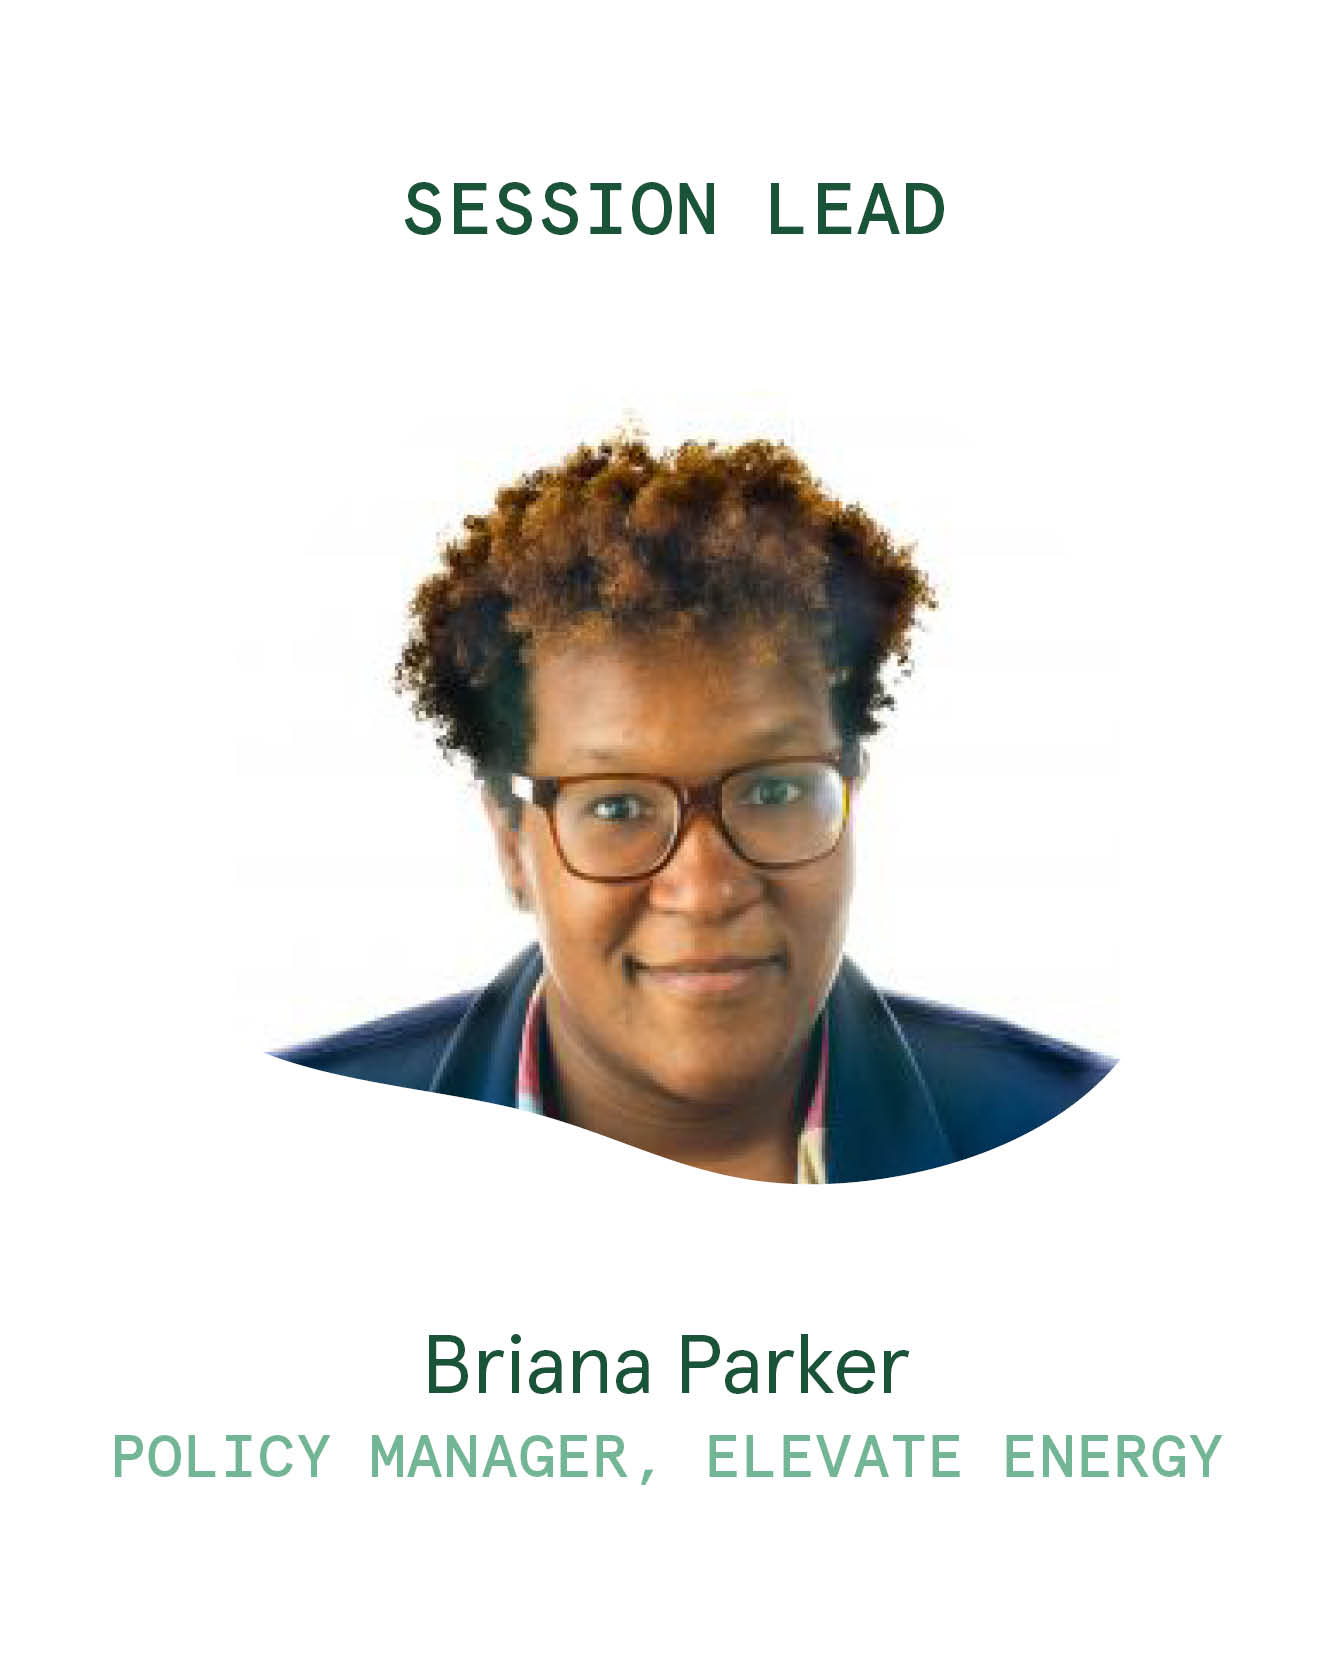 Session Lead_Briana Parker